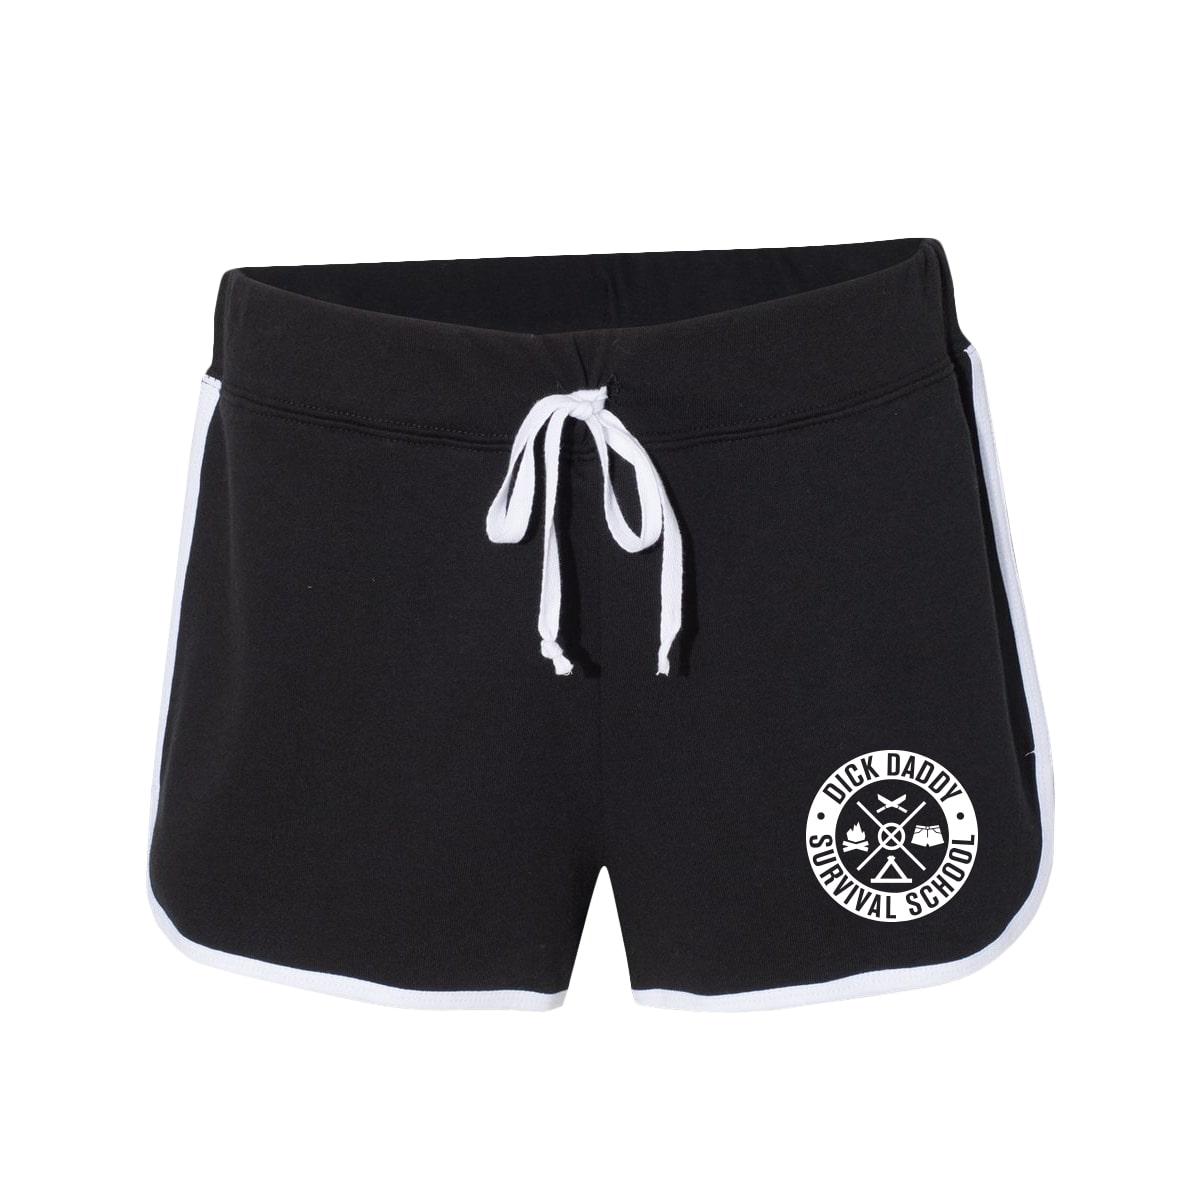 DDSS Black Women's Shorts